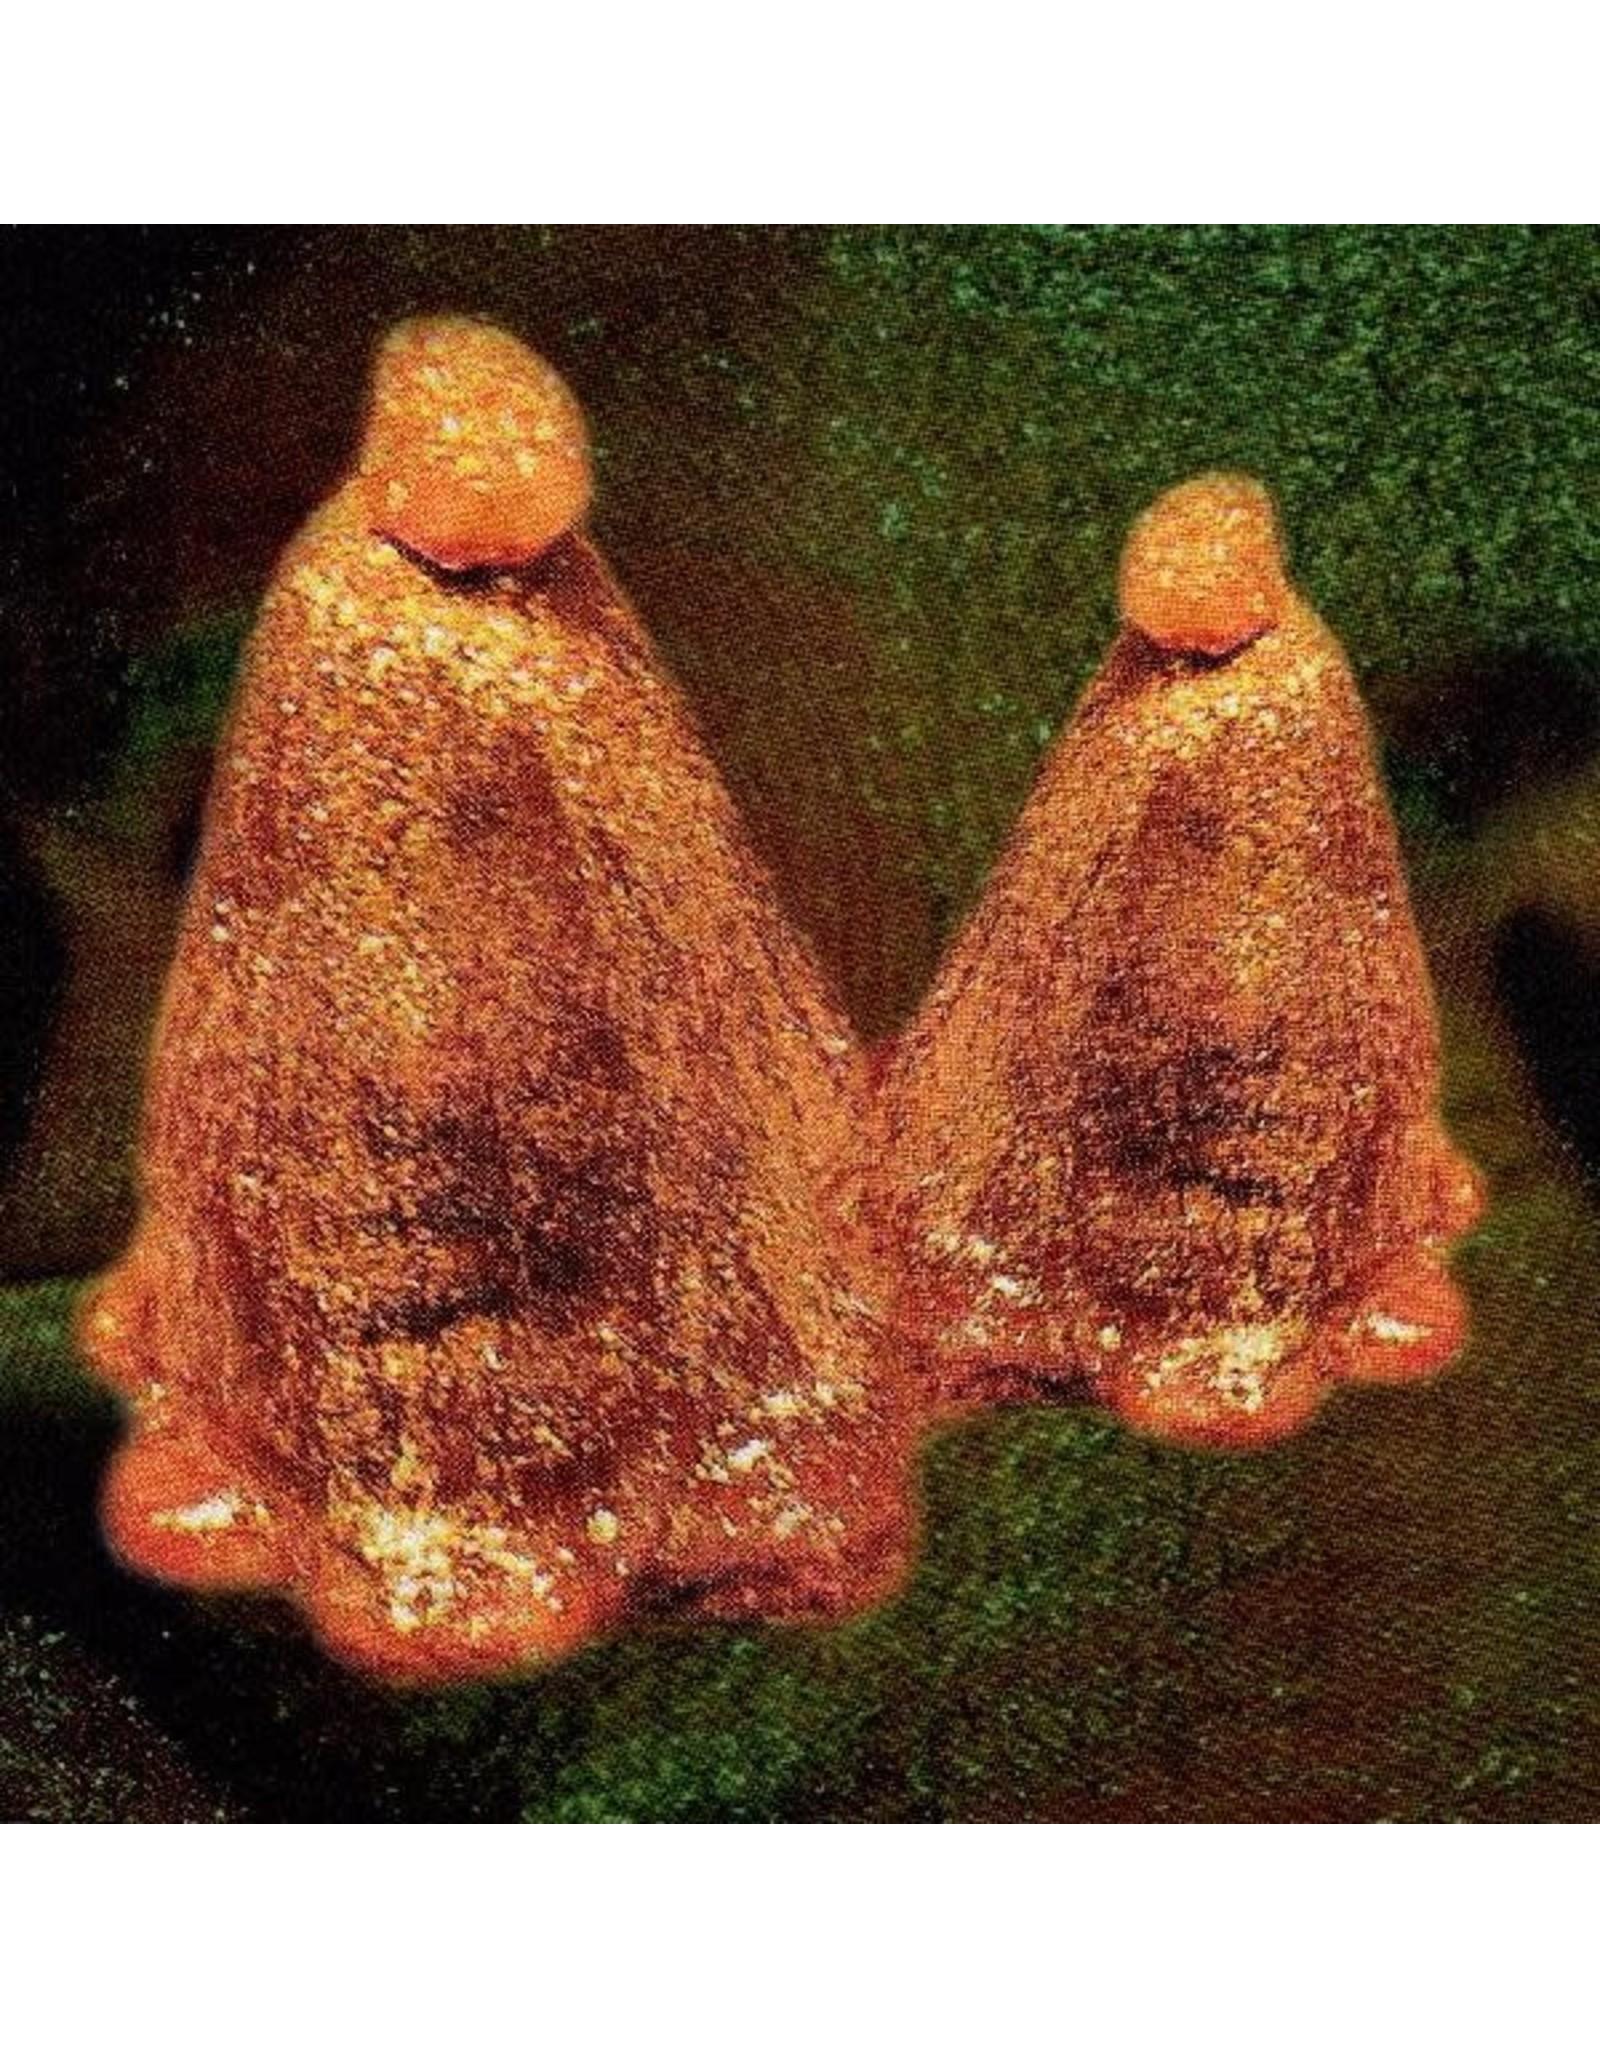 New Vinyl Black To Comm - Oocyte Oil & Stolen Androgens (IEX, Colored) LP